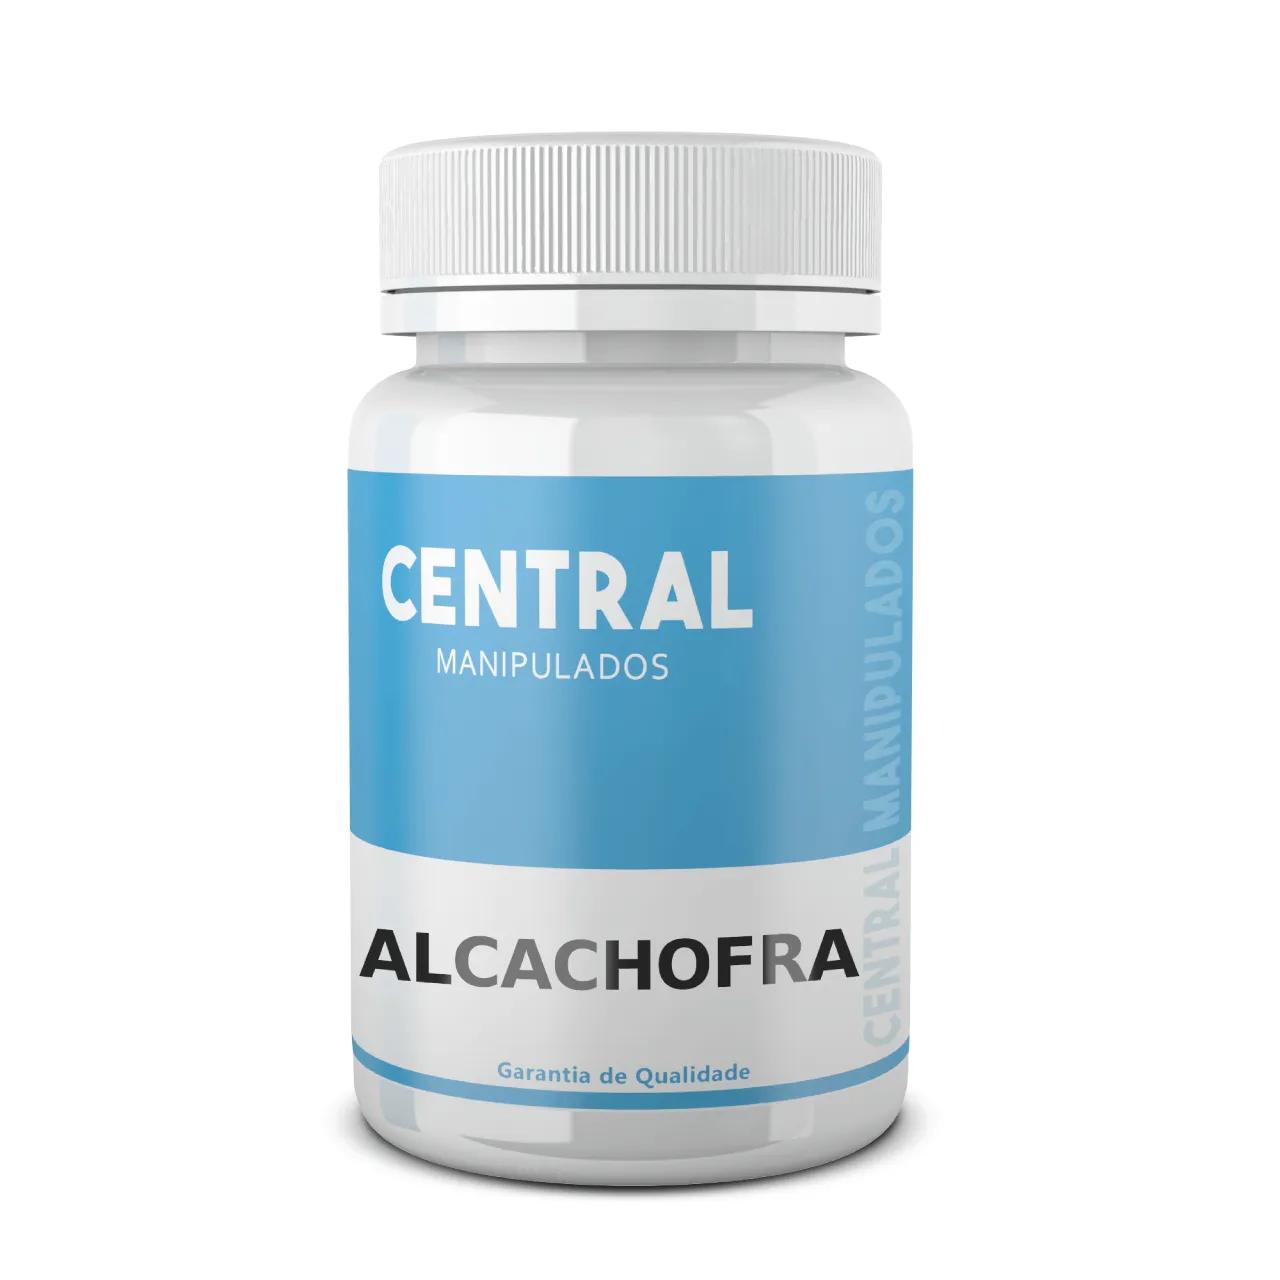 Alcachofra 250mg - 90 cápsulas - Diurético, Antioxidante, Hepatoprotetora